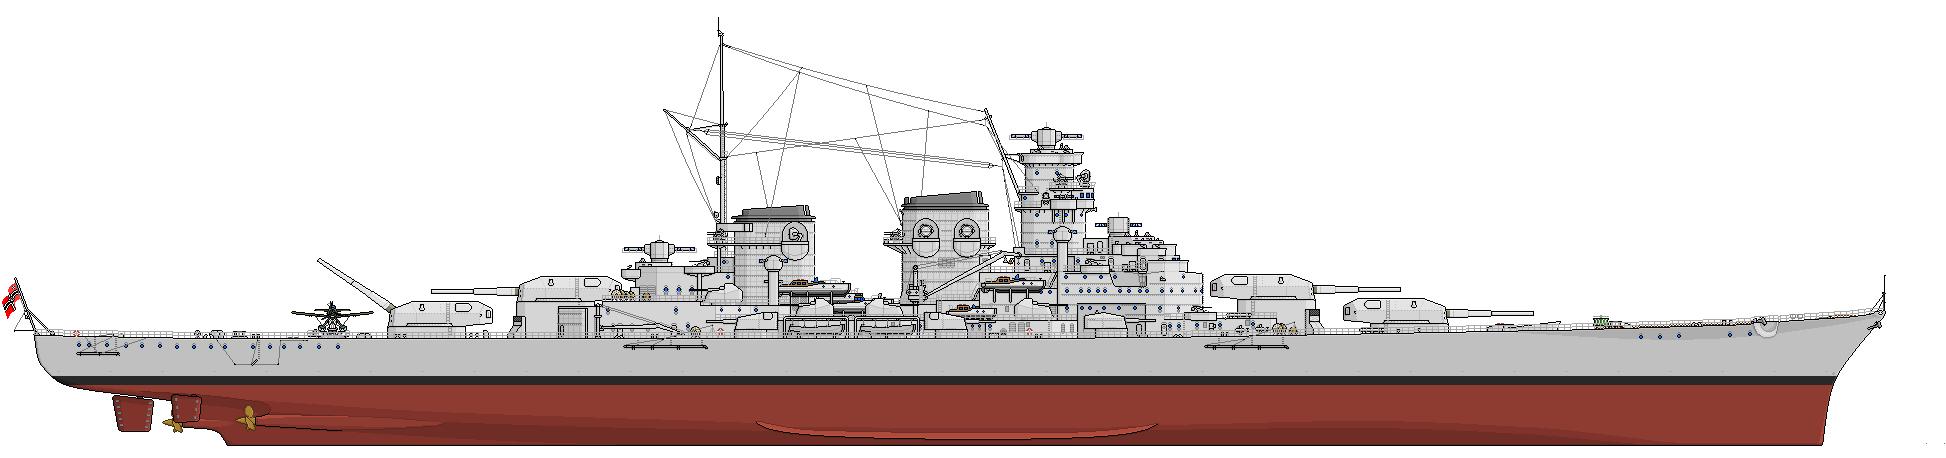 A H-39 oldalnézeti rajza.